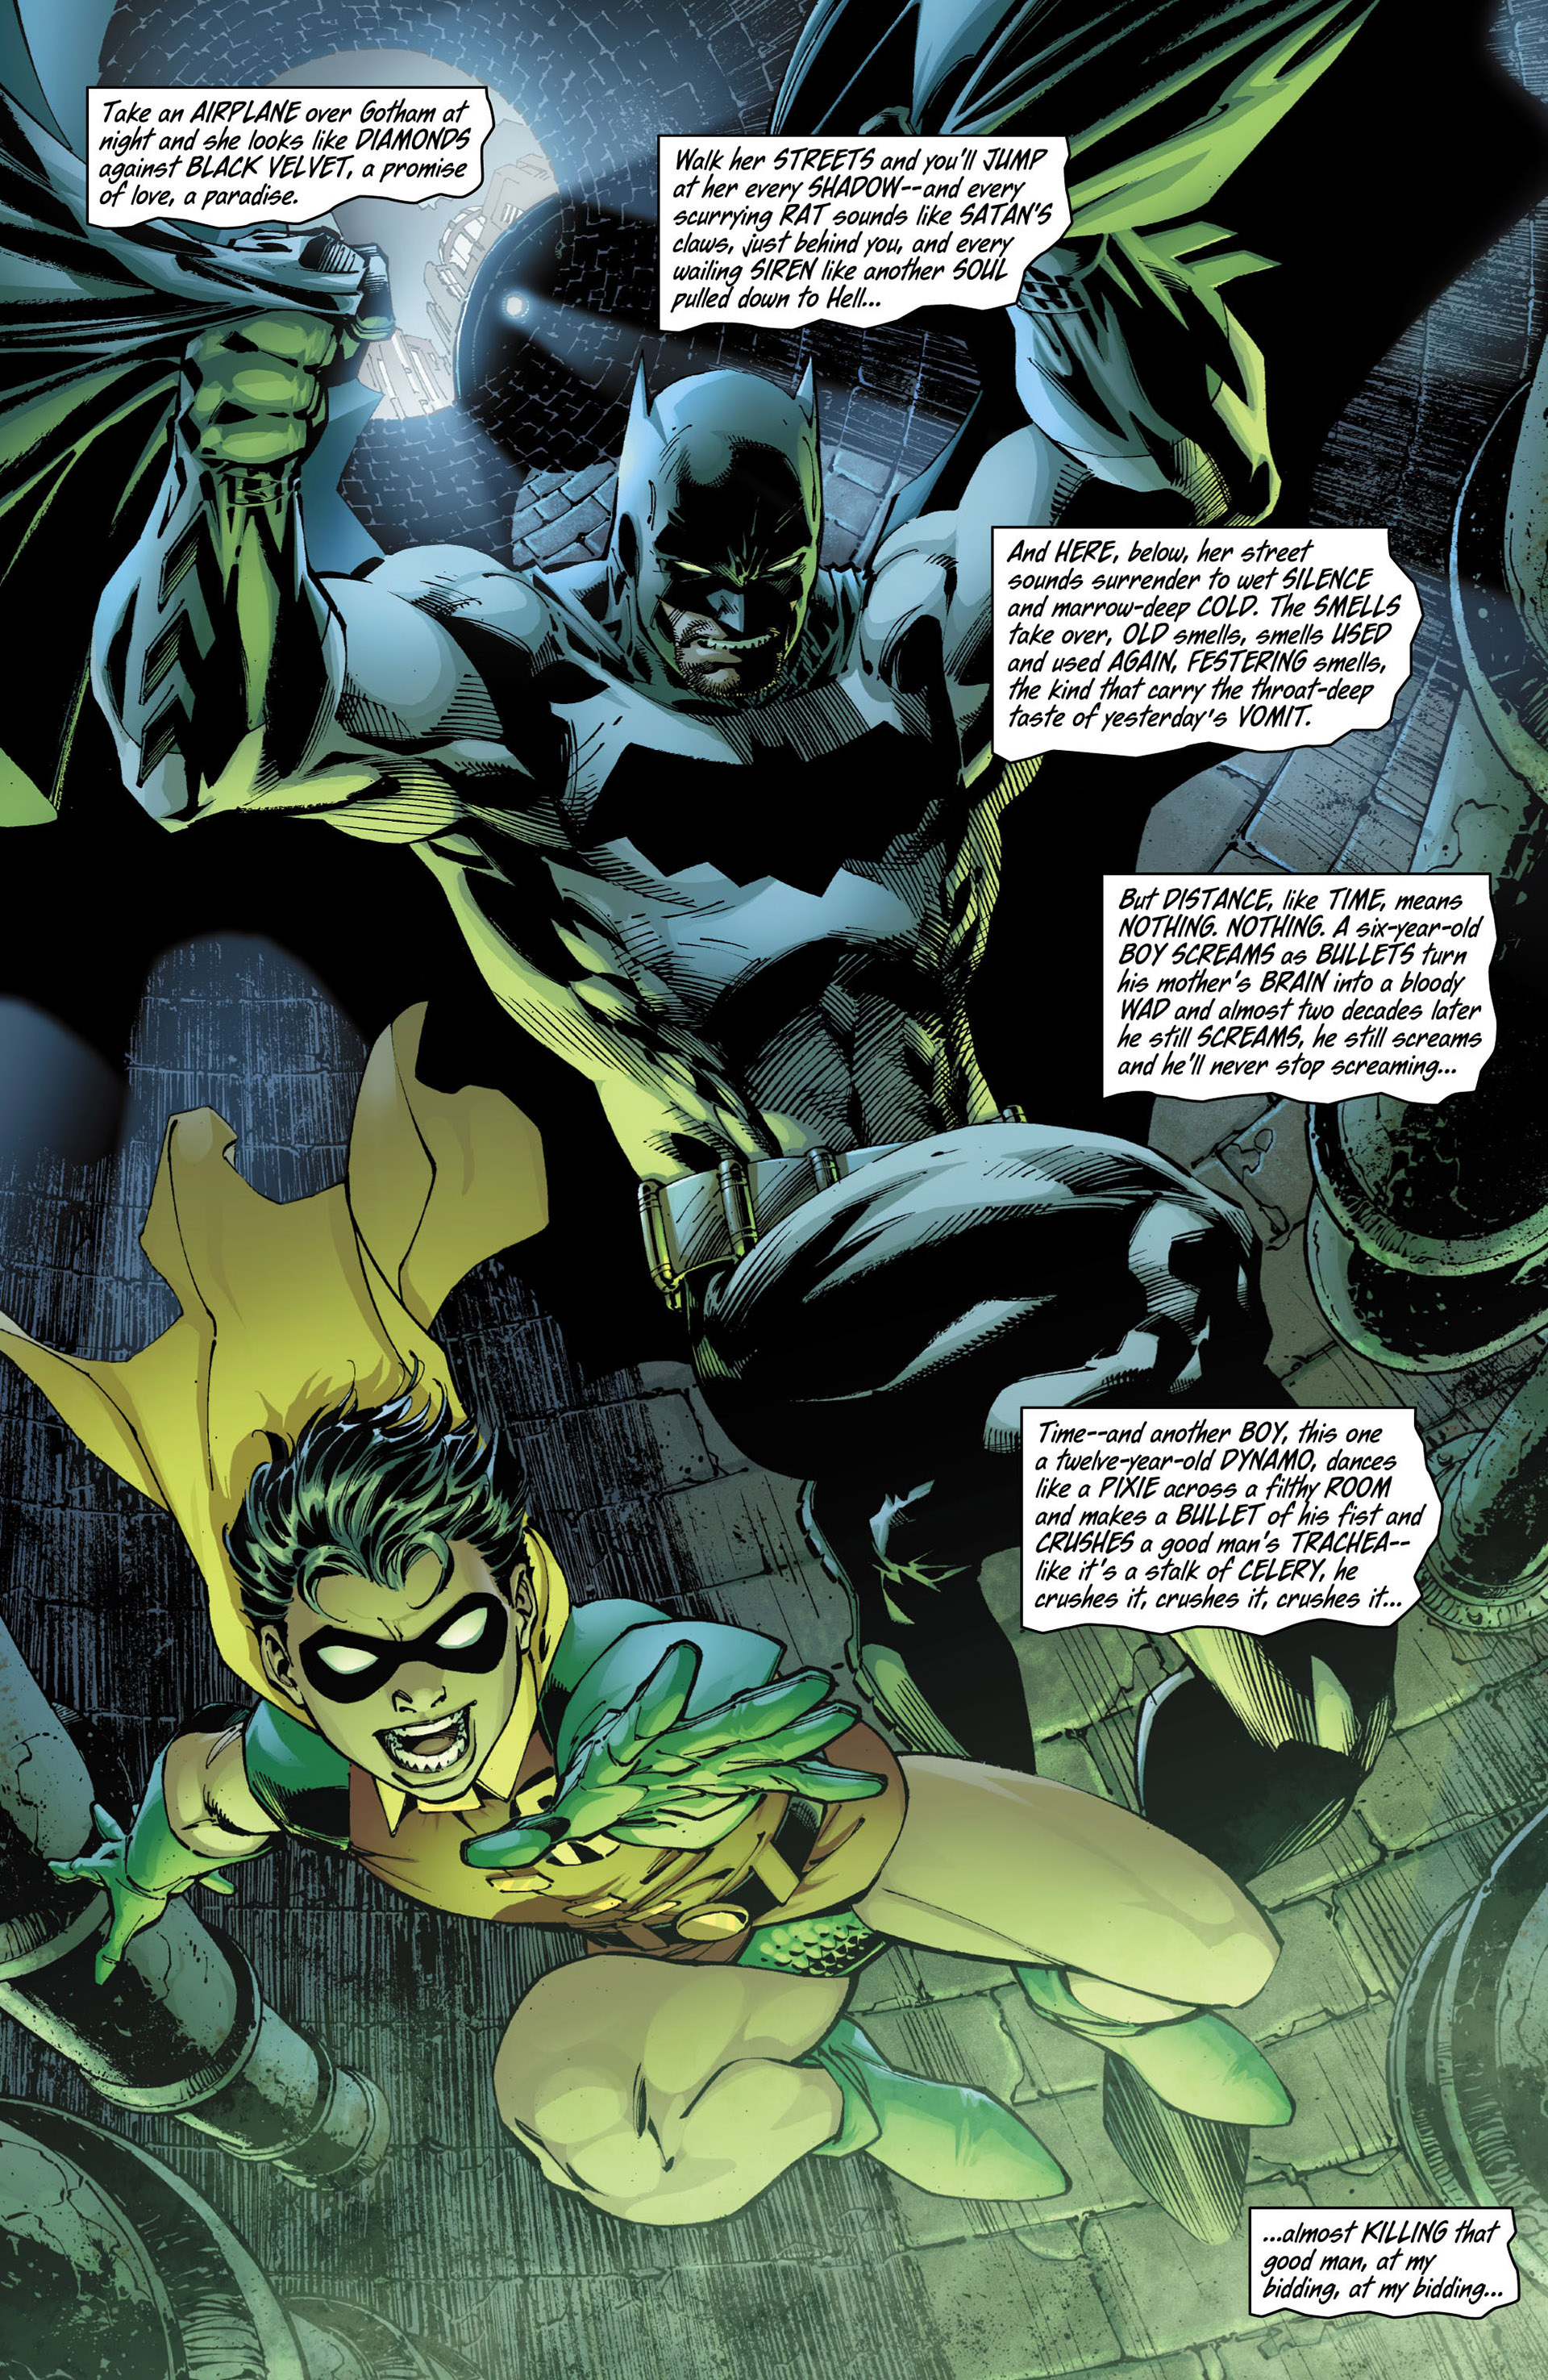 Read online All Star Batman & Robin, The Boy Wonder comic -  Issue #10 - 9